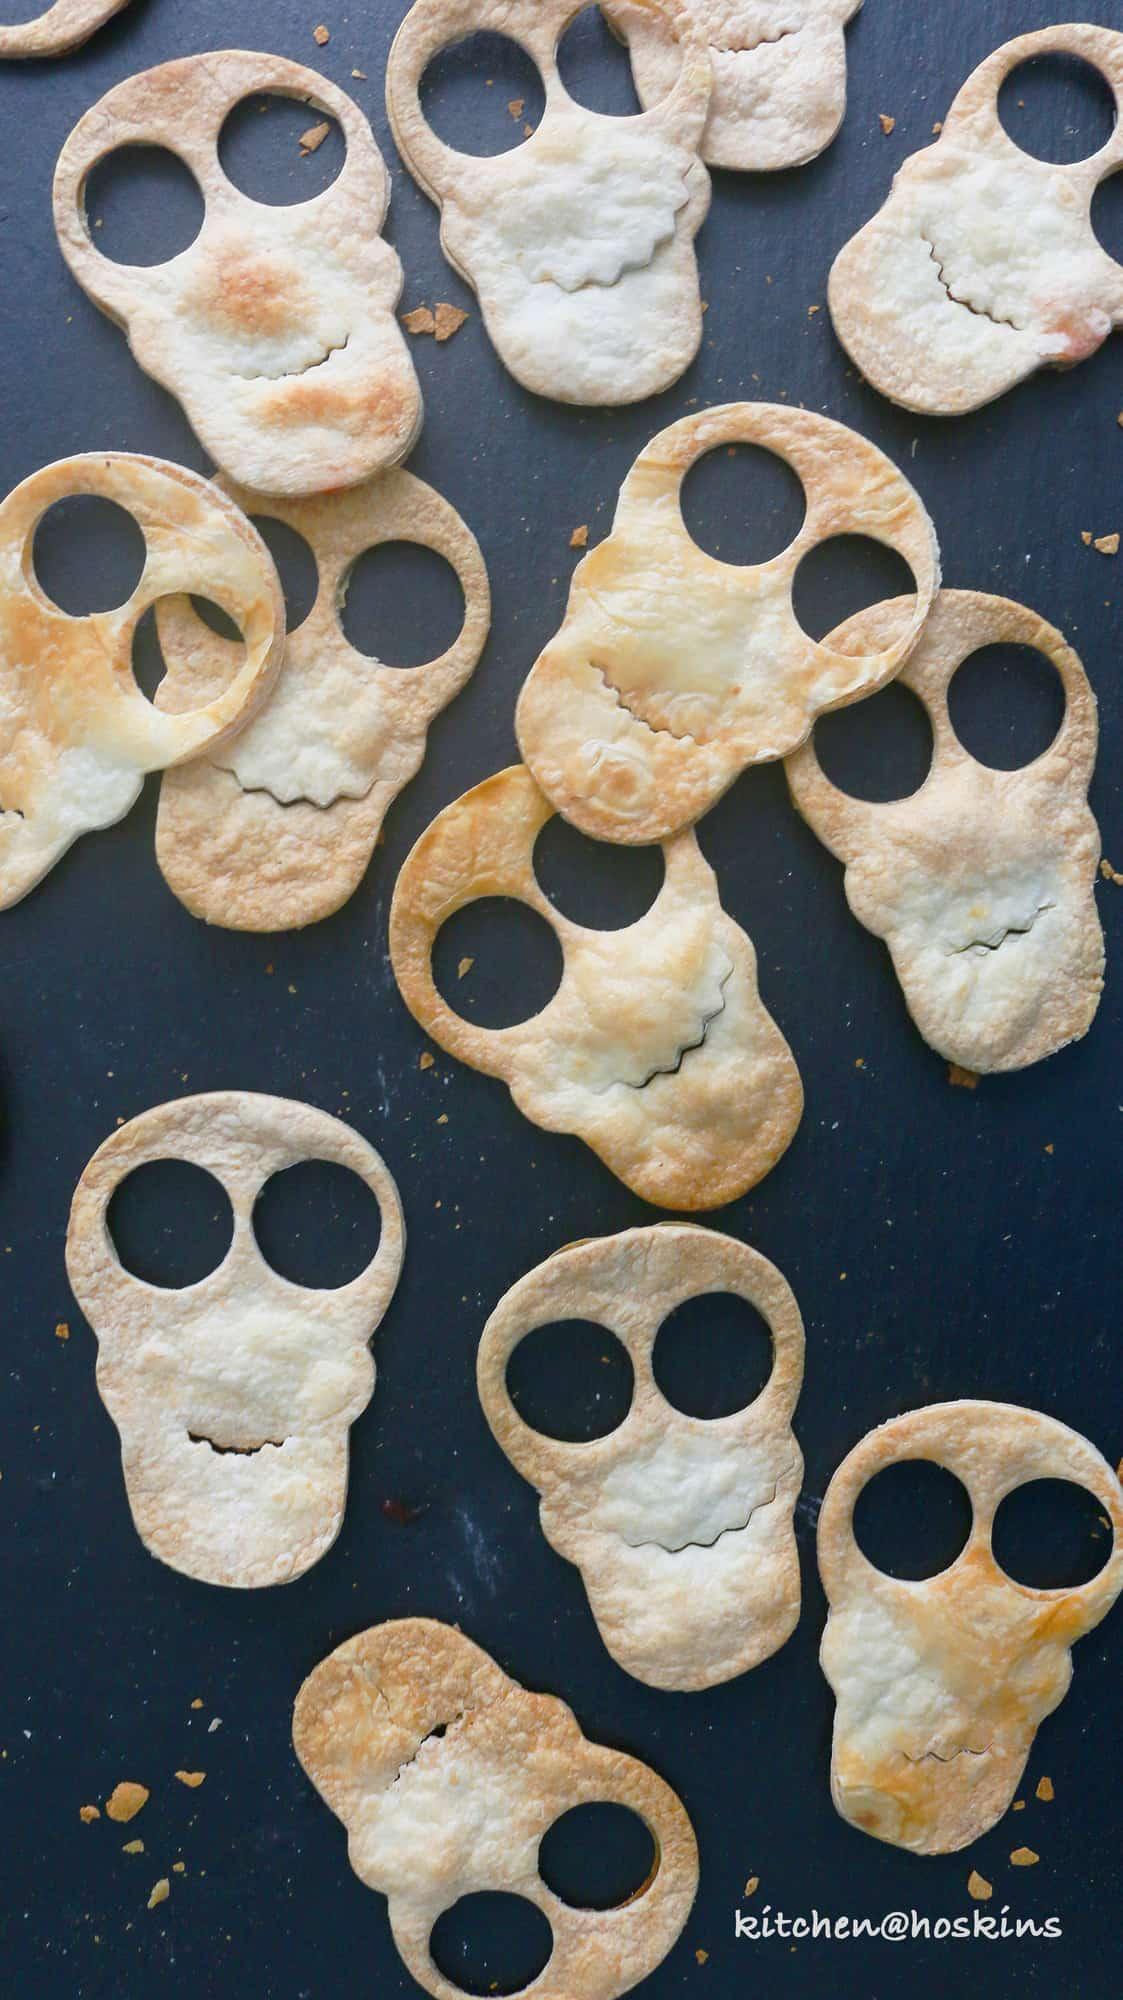 Halloween skull chips and salsa